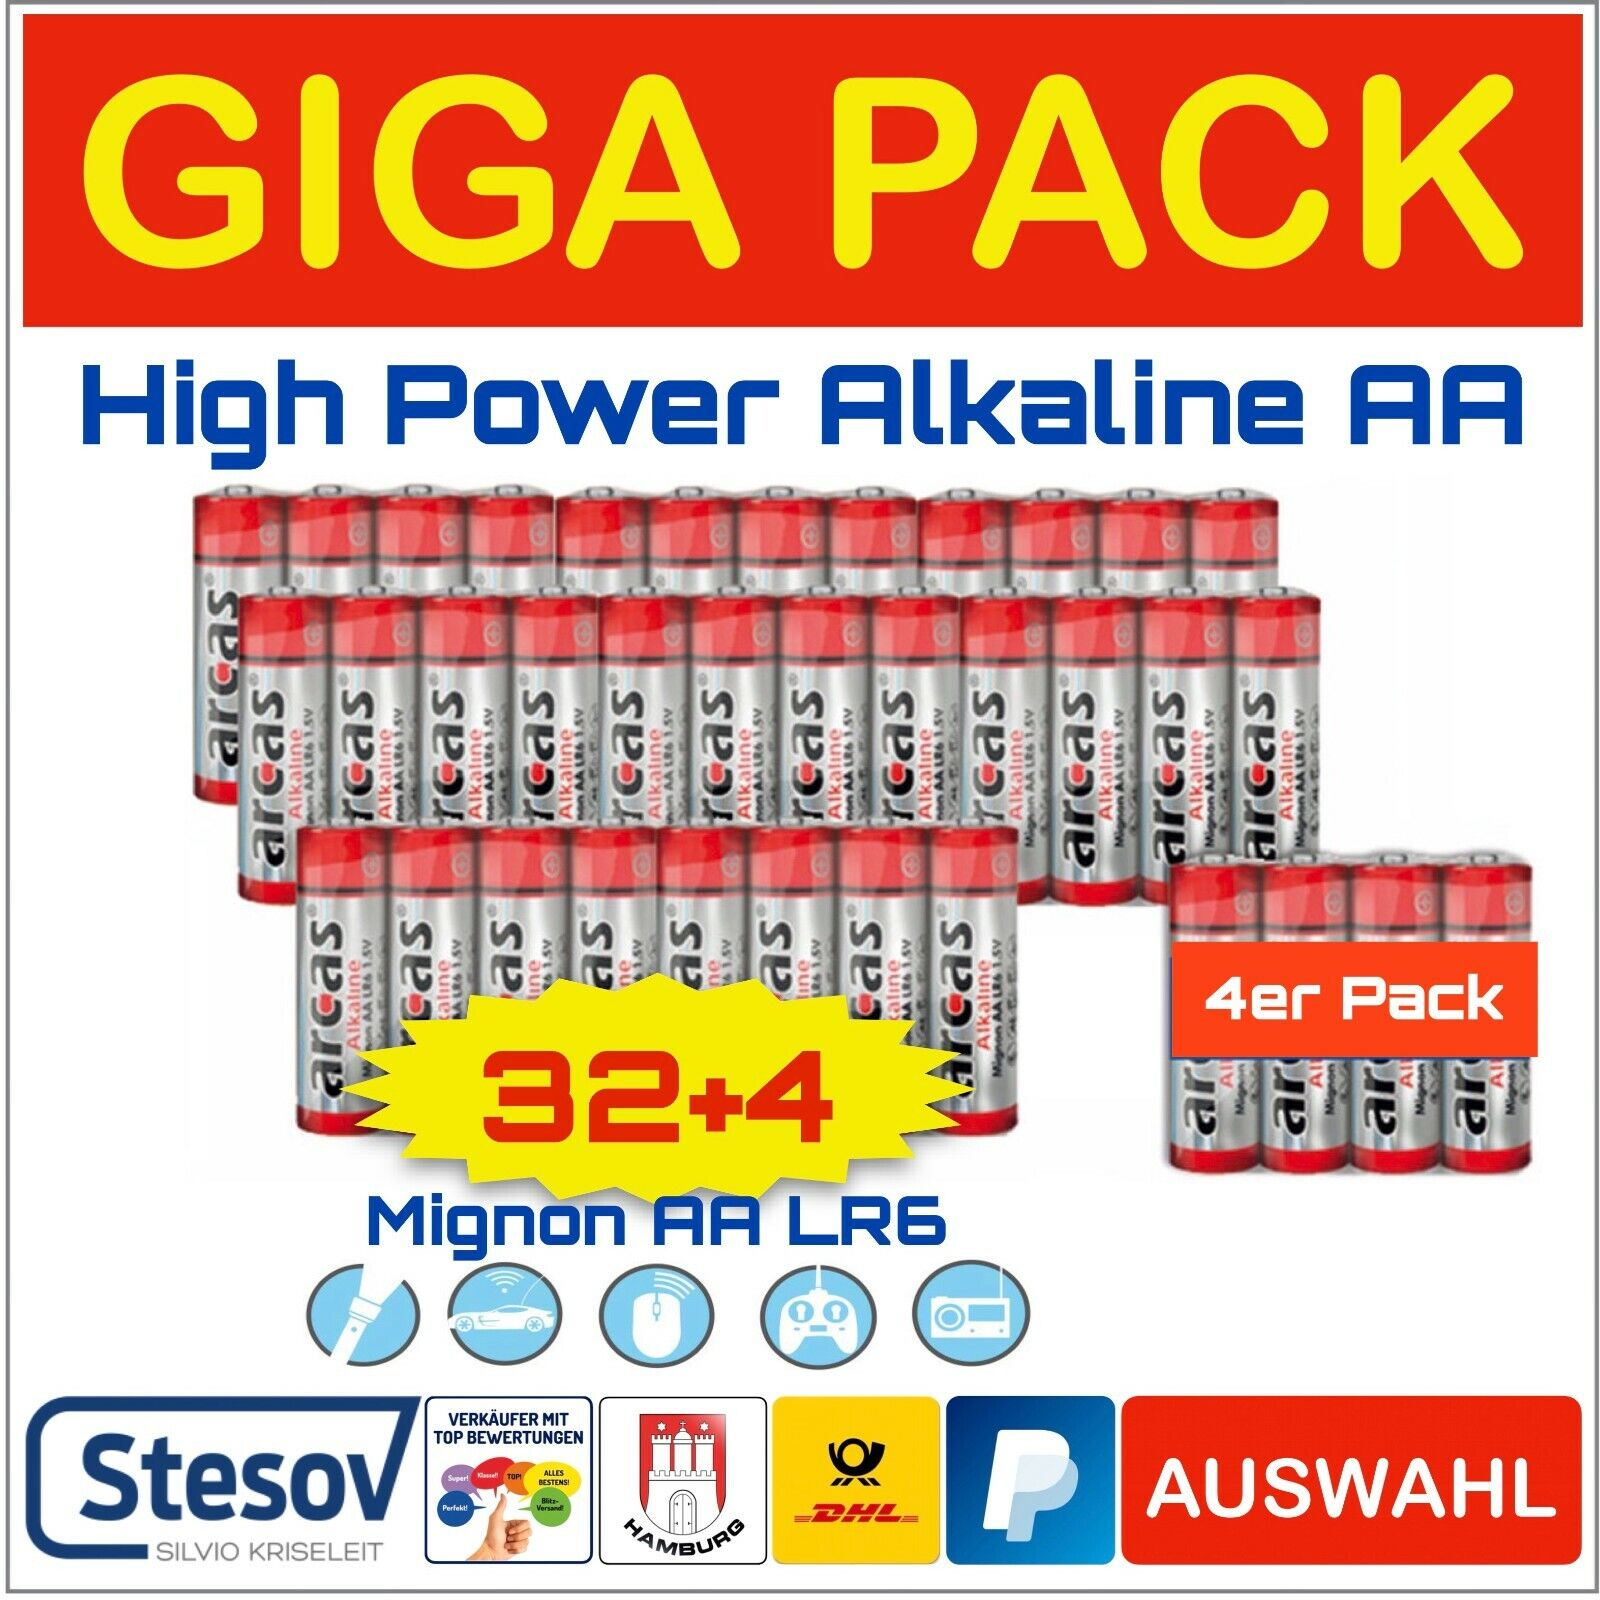 ARCAS 36er Pack High Power Alkaline Batteries Economy Pack Mignon Aa LR6 32+4